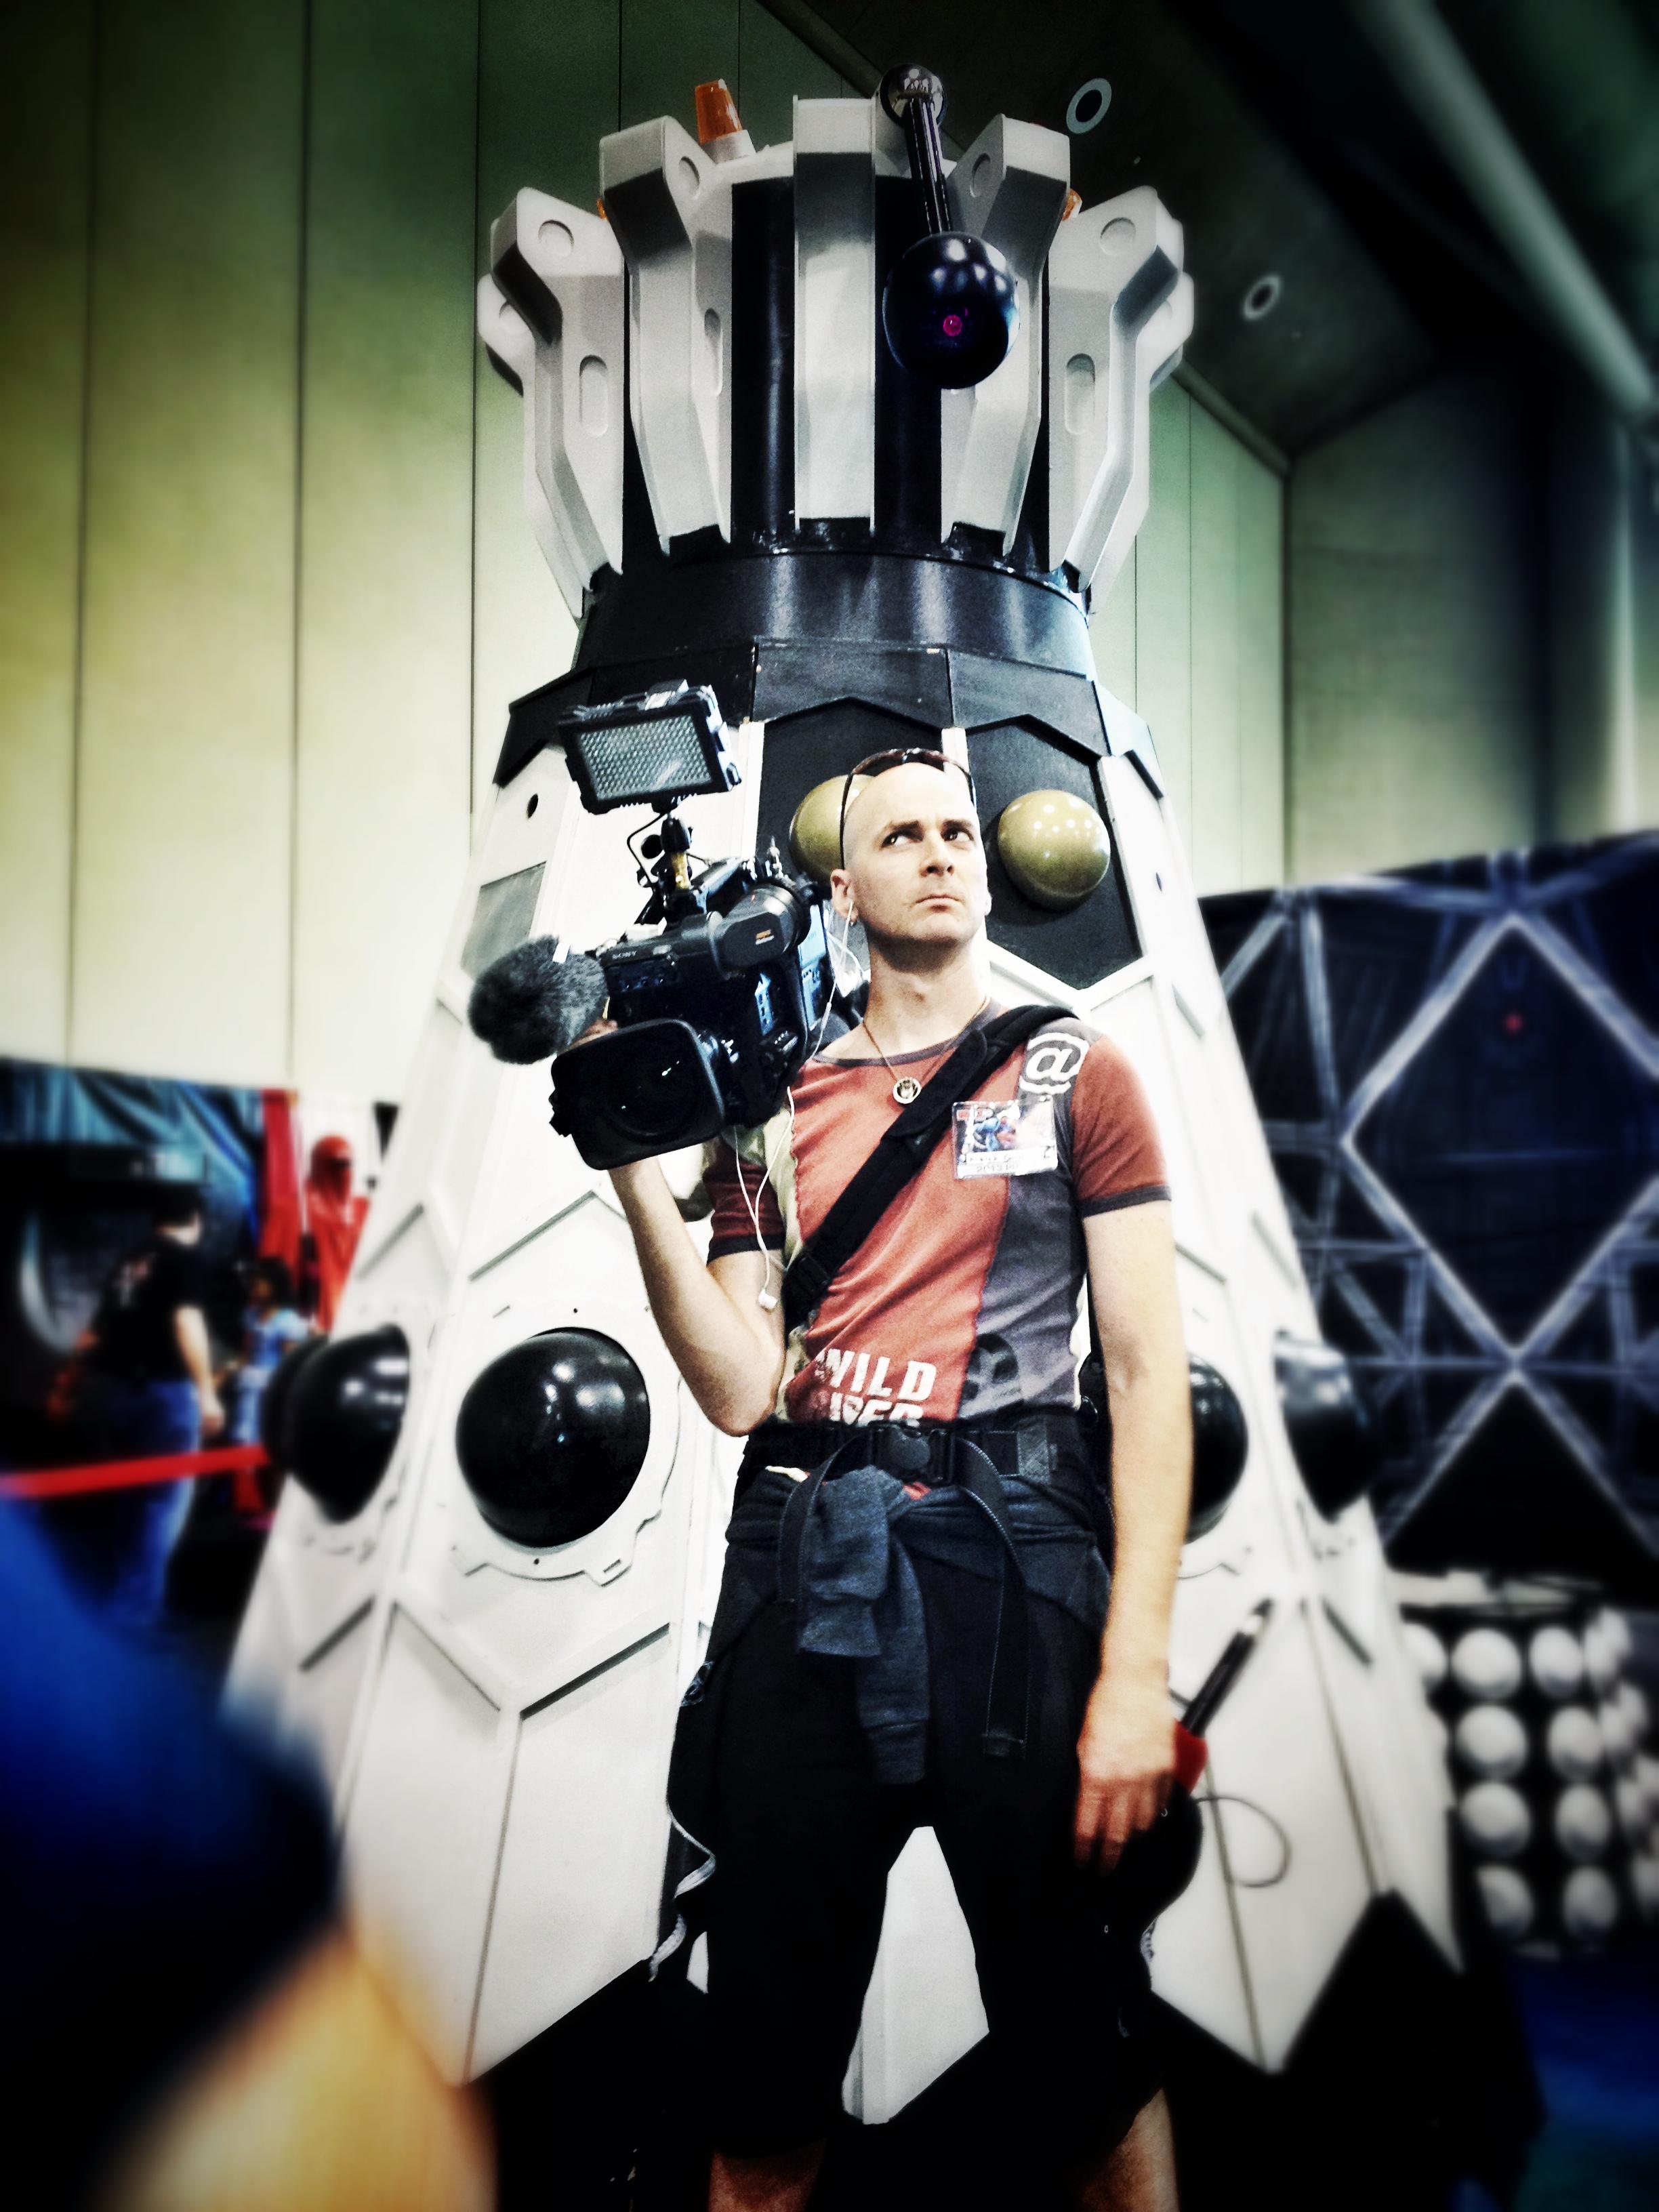 The Emperor Dalek